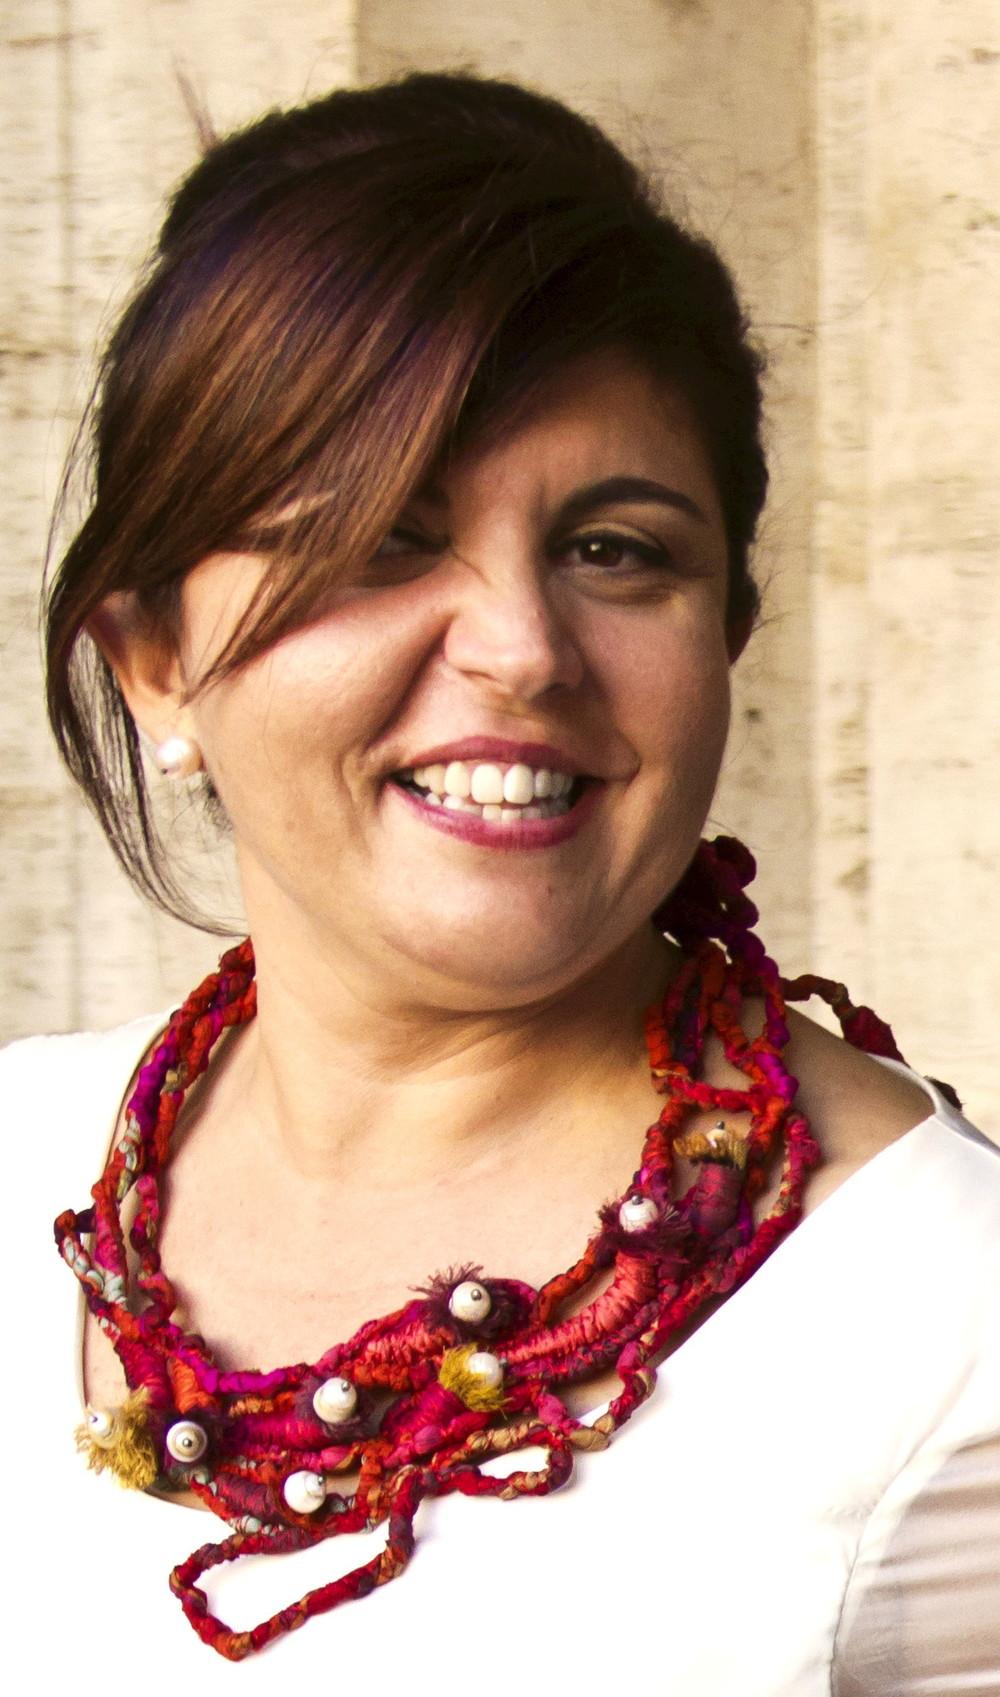 Mar Adentro - Francesca Cecchini (2013), necklace // Materials: repurposed sari silk, baroque pearls, oxidised silver, silk thread.